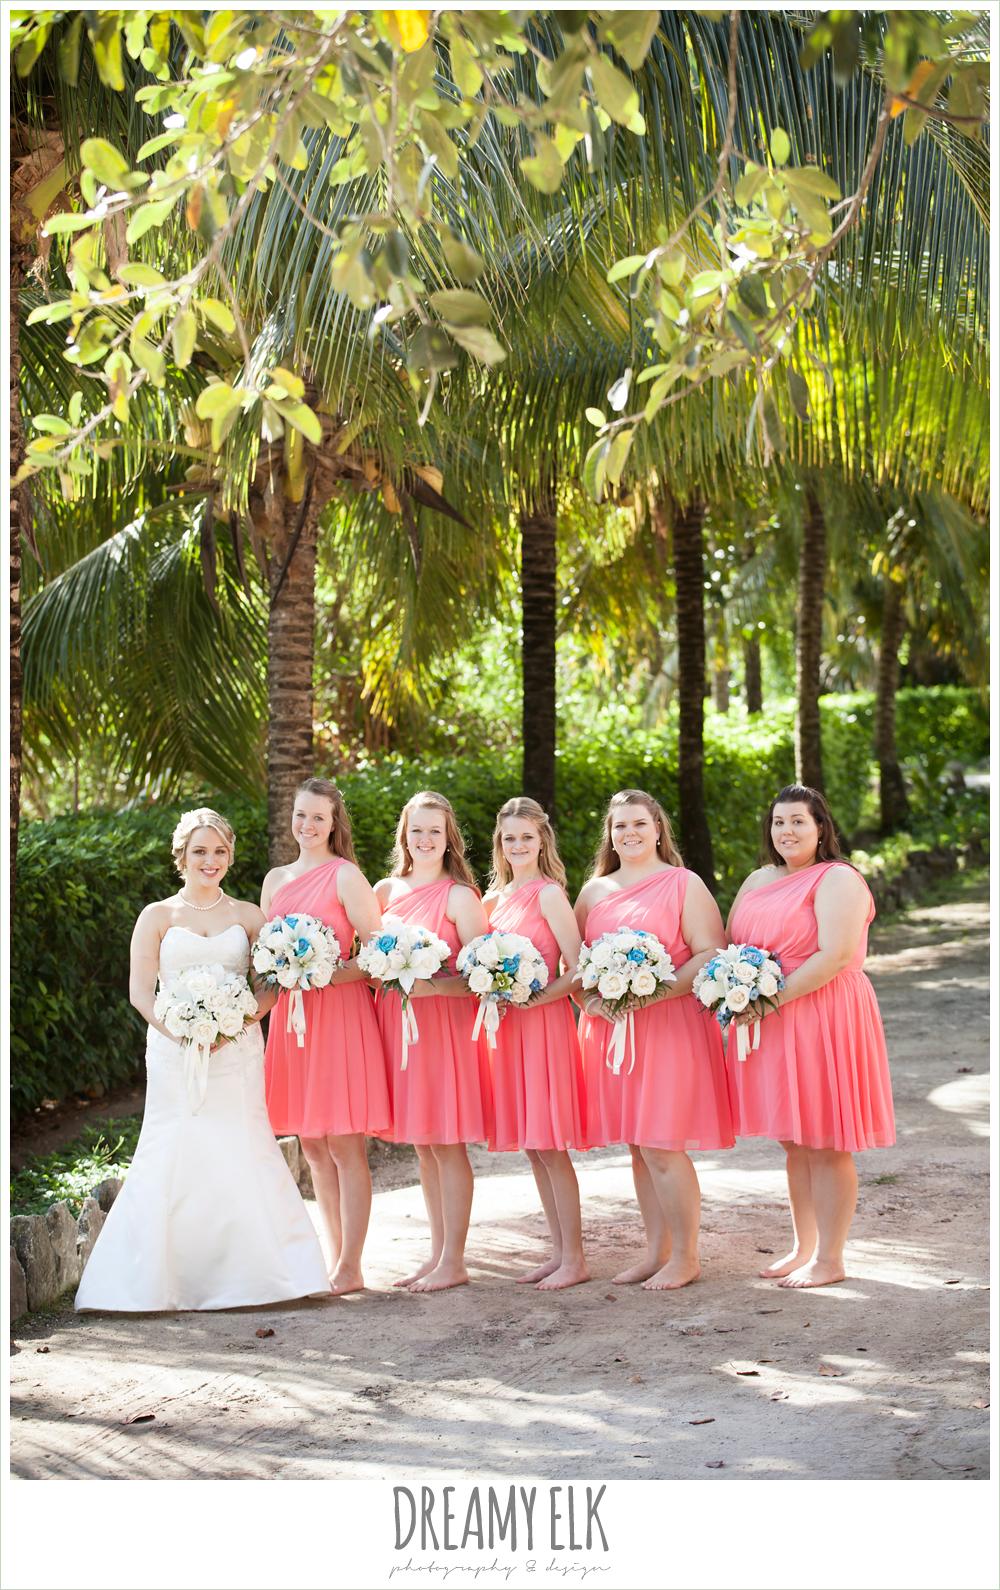 pink, one shoulder bridesmaids dresses, fit and flare wedding dress, destination wedding, cozumel {dreamy elk photography and design} photo